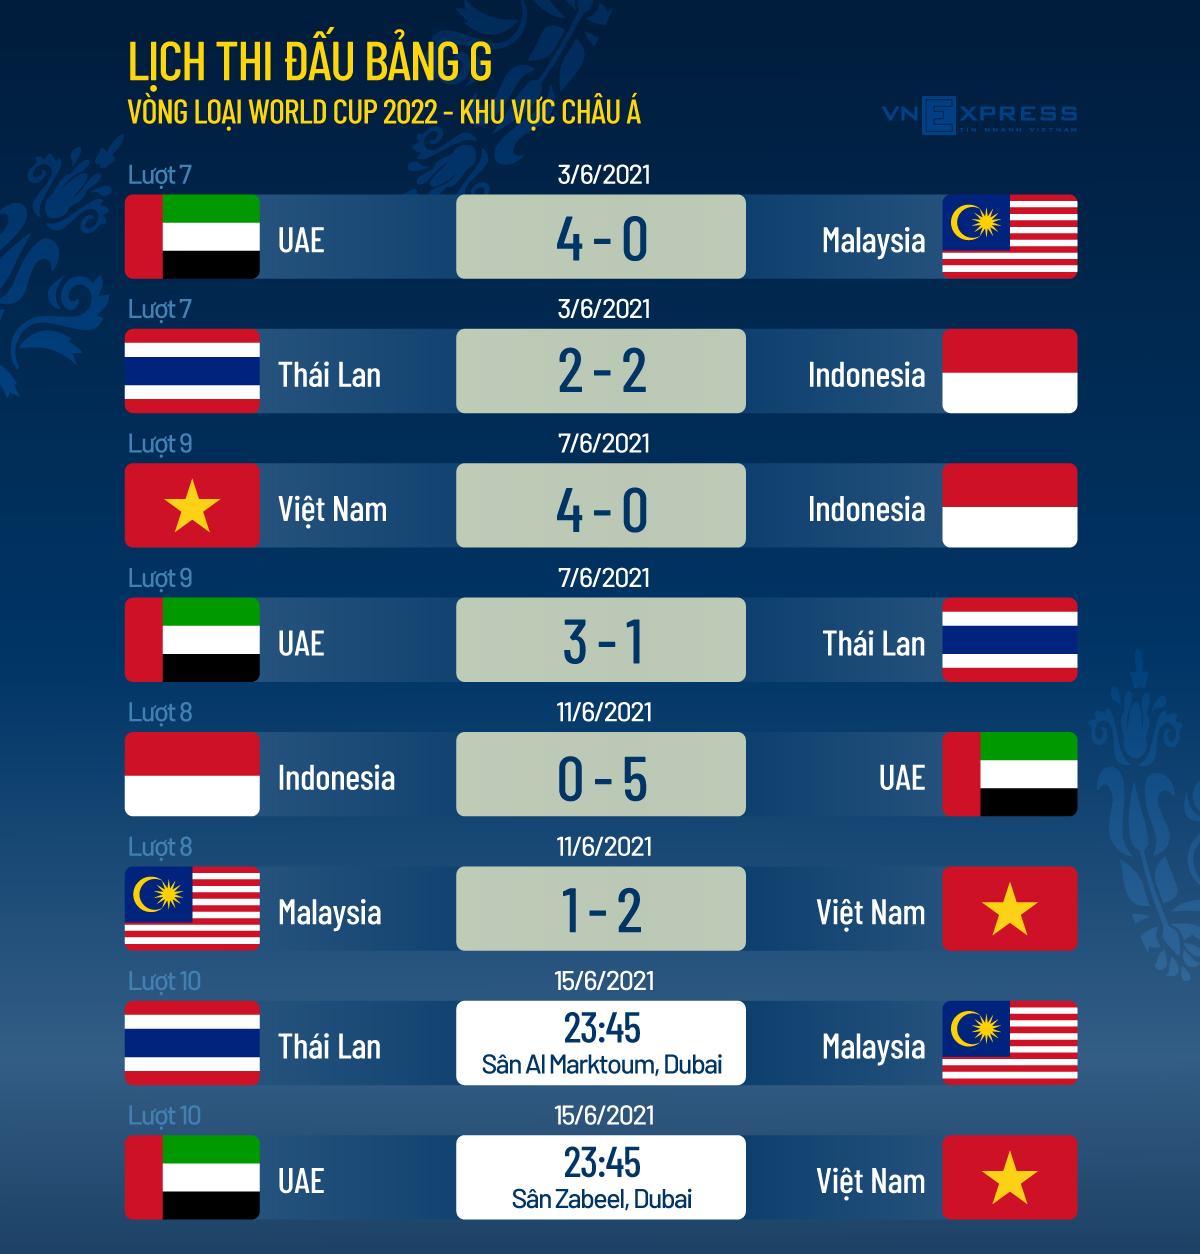 HLV Van Marwijk: UAE giờ mạnh nhiều so với khi thua Việt Nam - 1